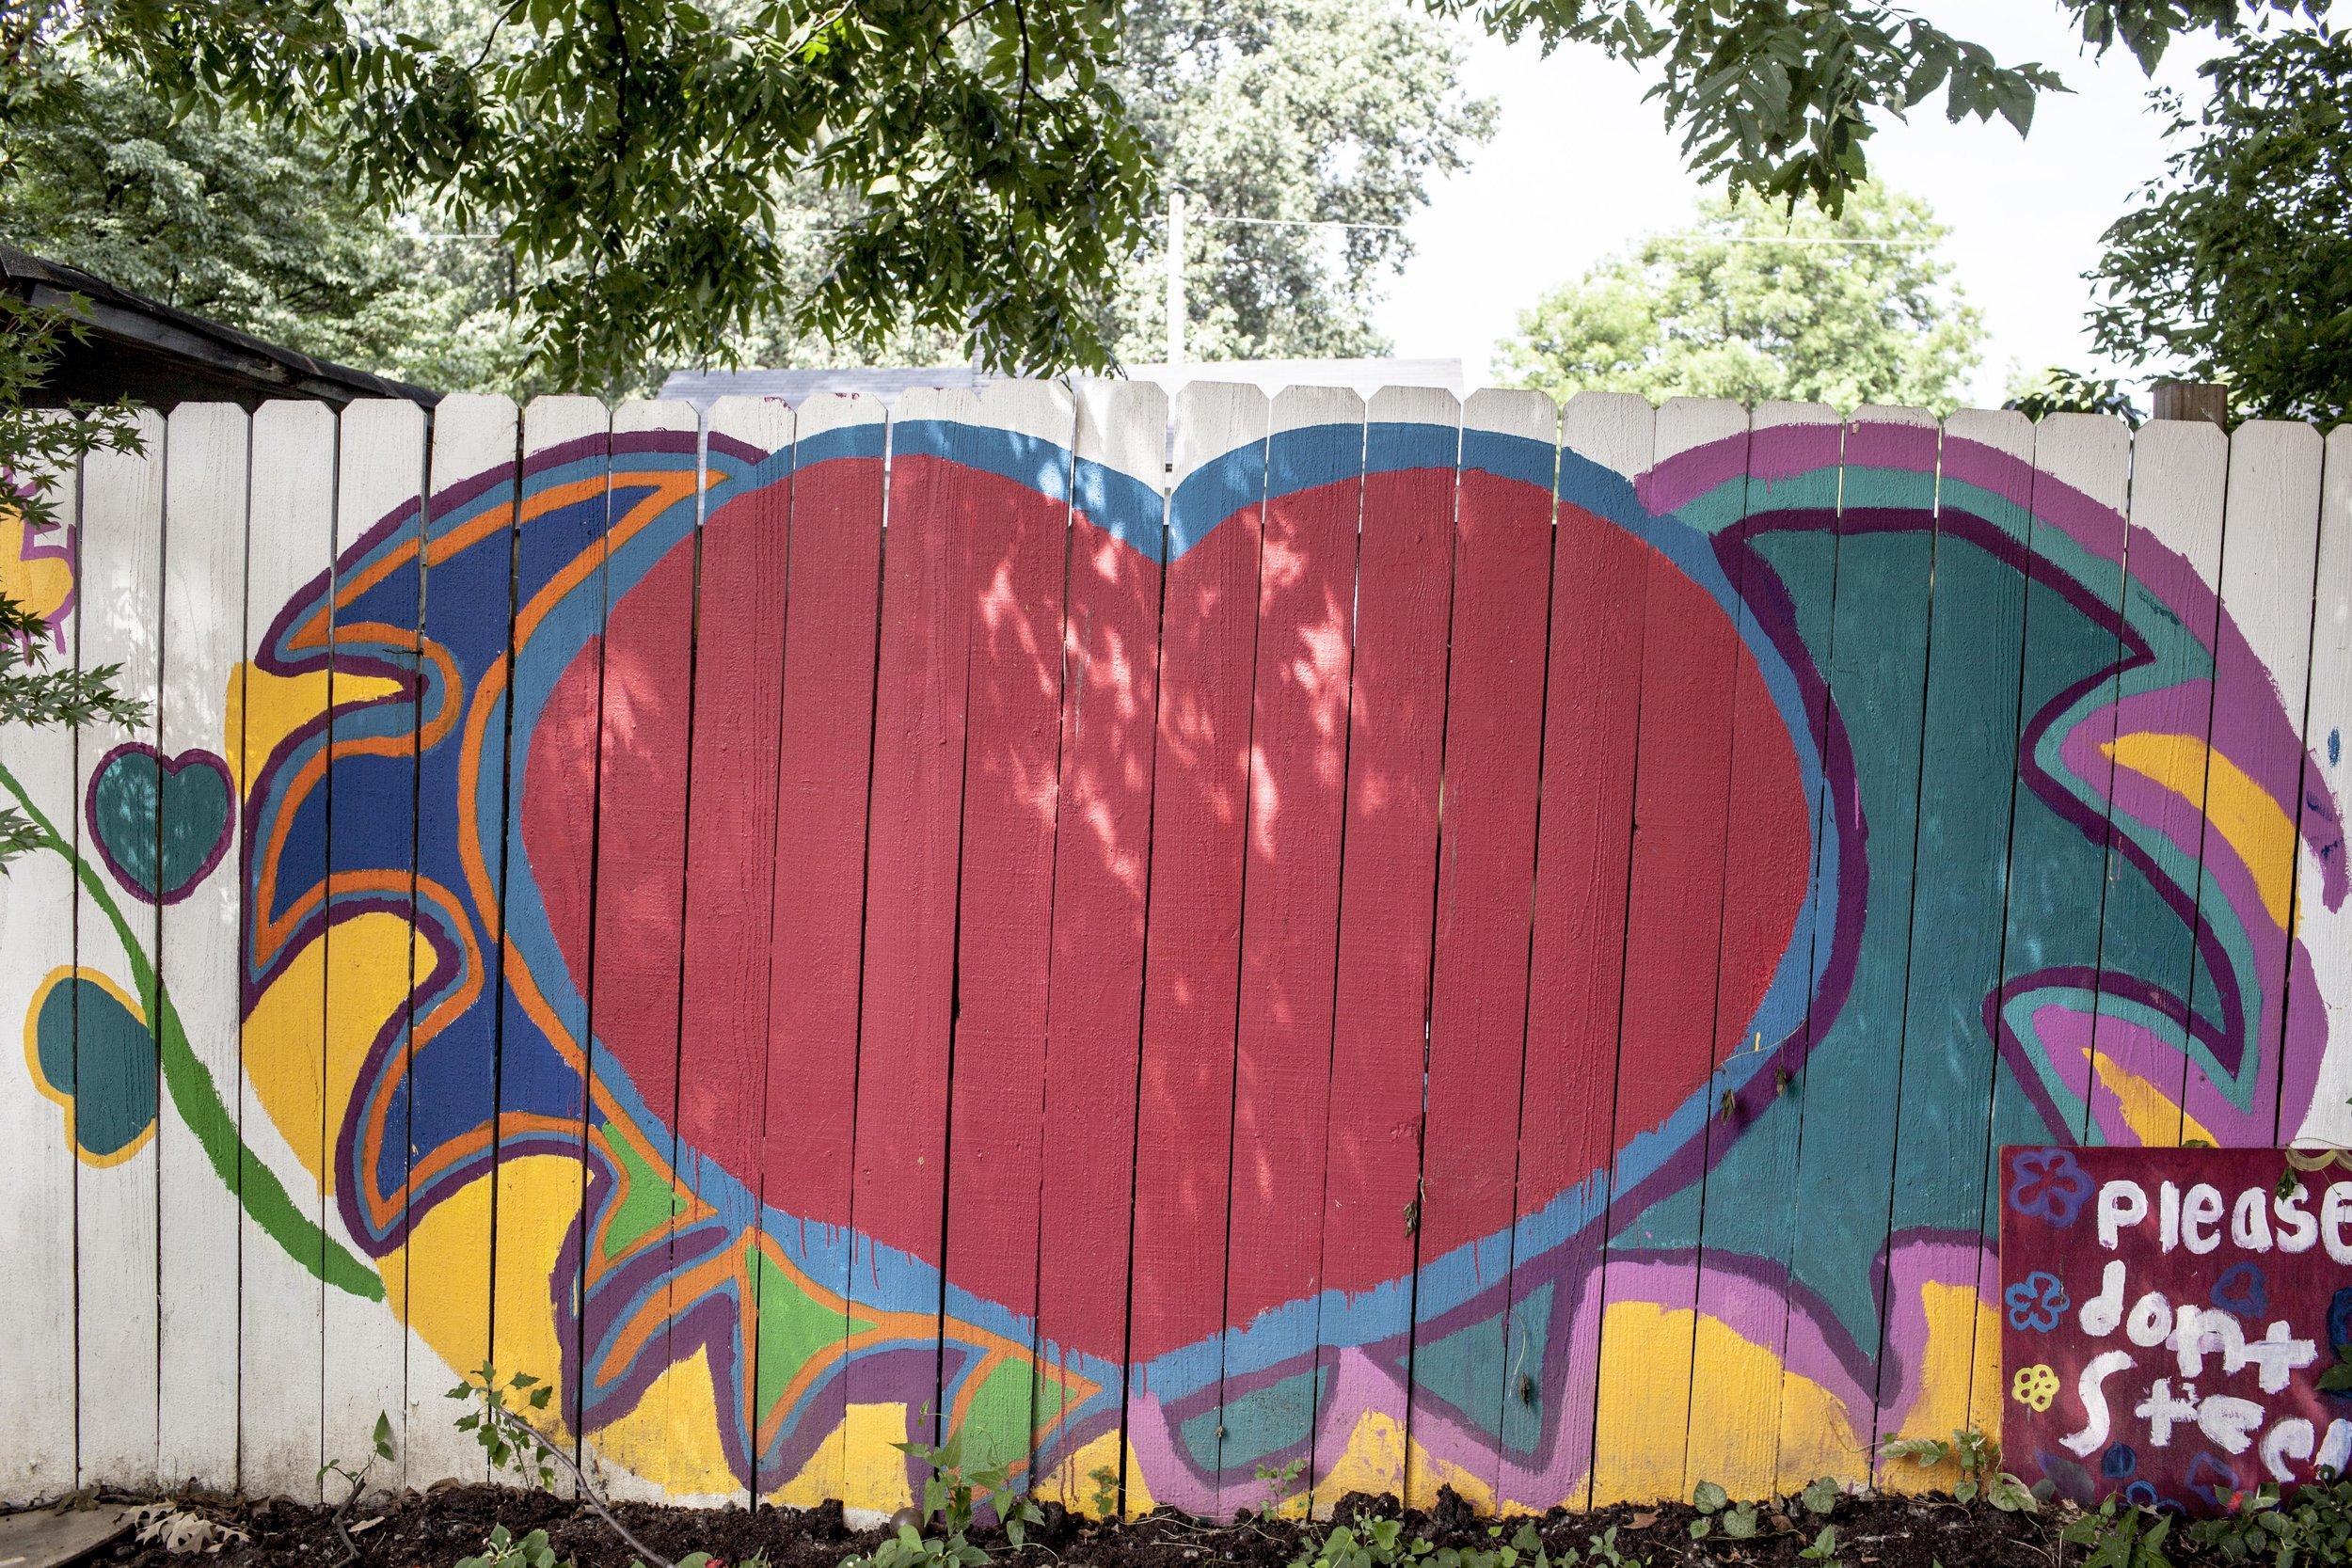 The Art Garden's back fence designed by Founding Member, Brianna